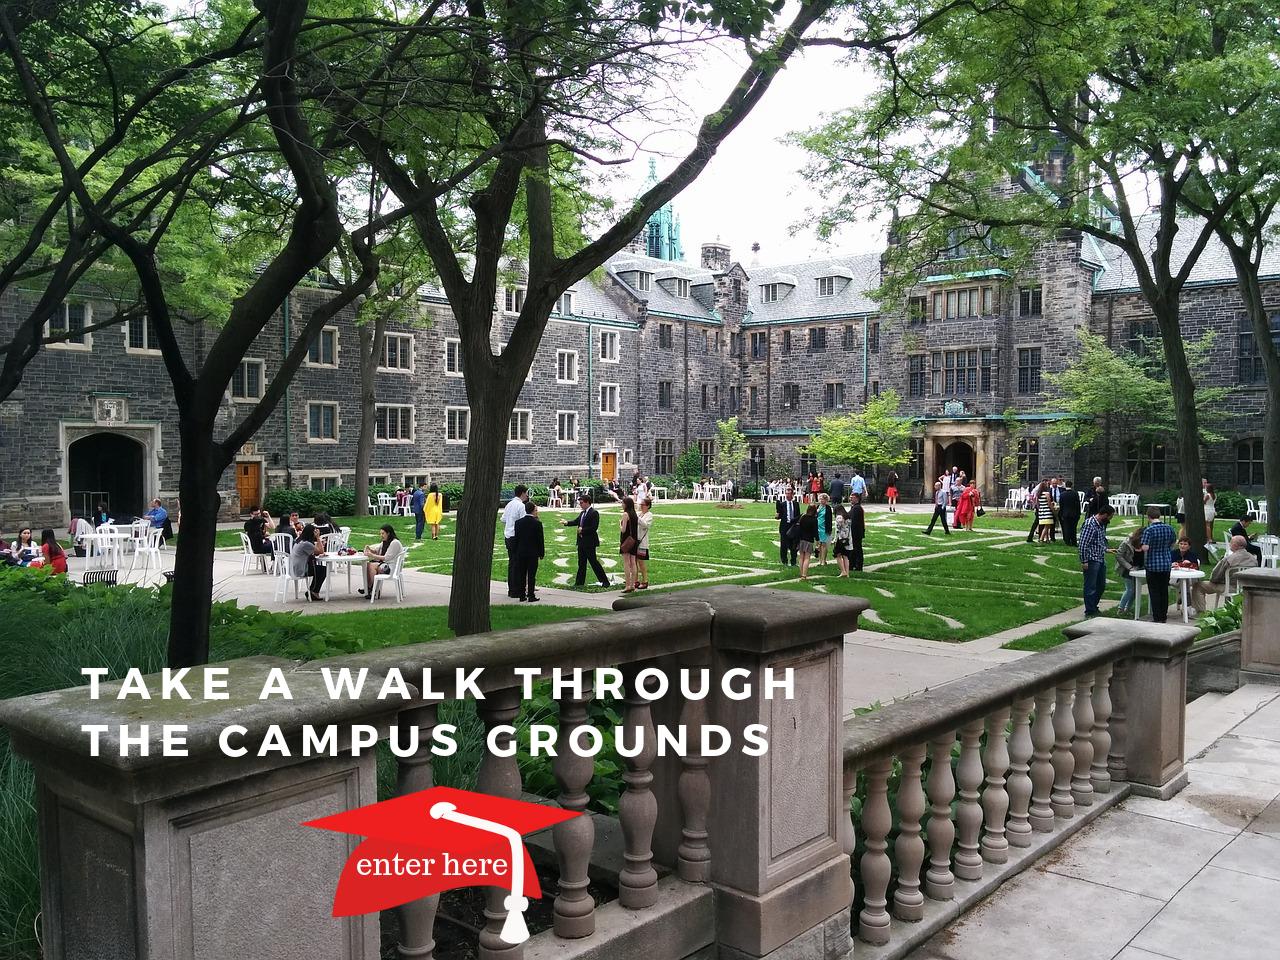 Take a walk through the campus - click for access